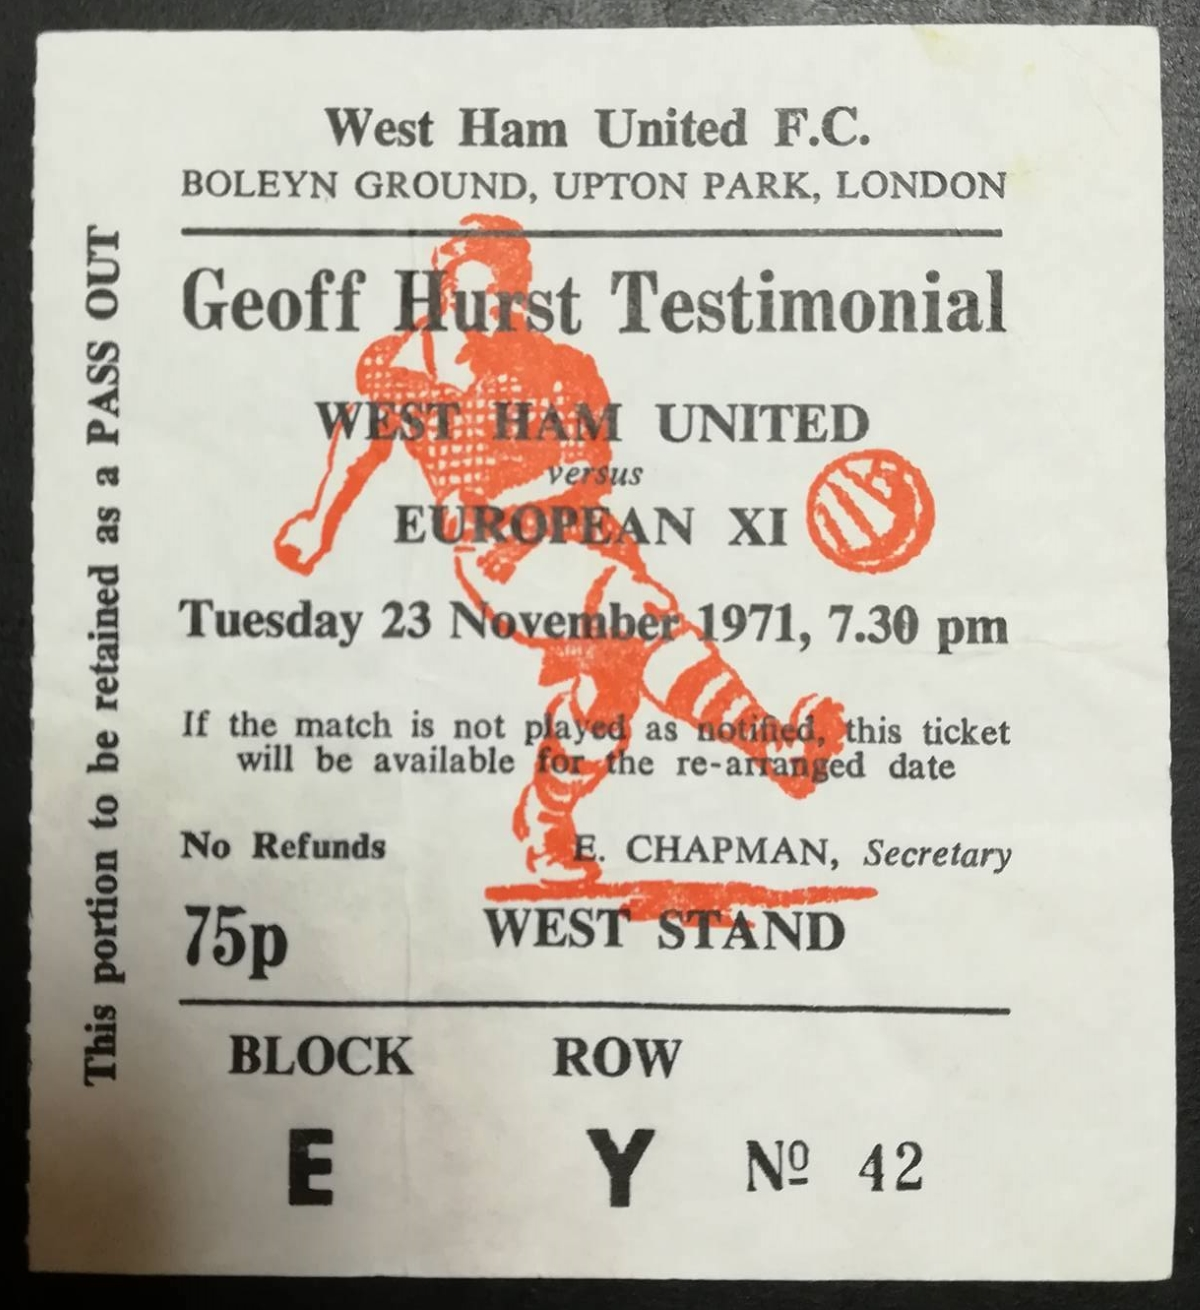 Geoff Hurst testimonial memorabilia